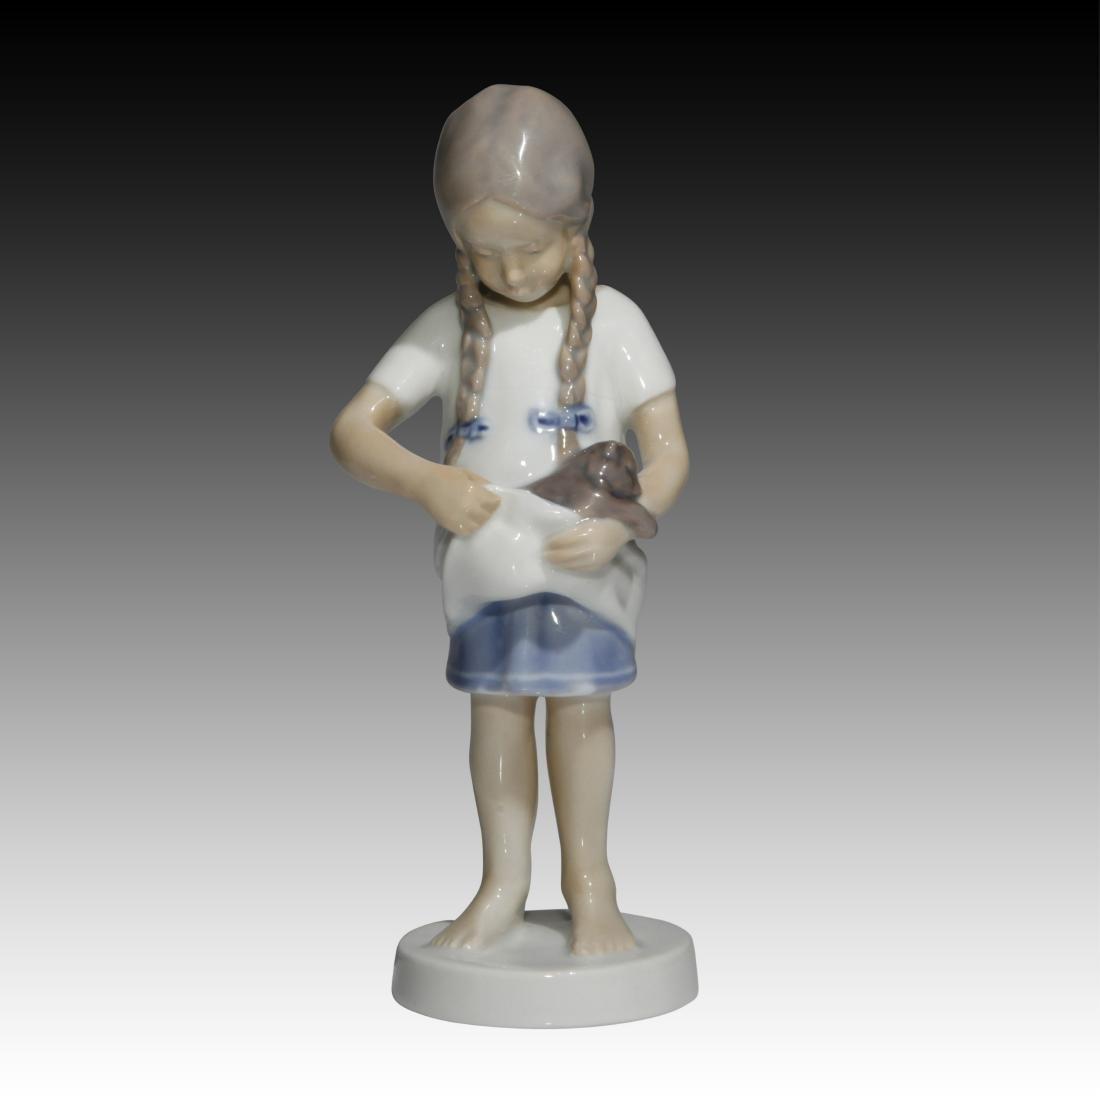 Bing & Grondahl Young Girl with Kitten Figurine